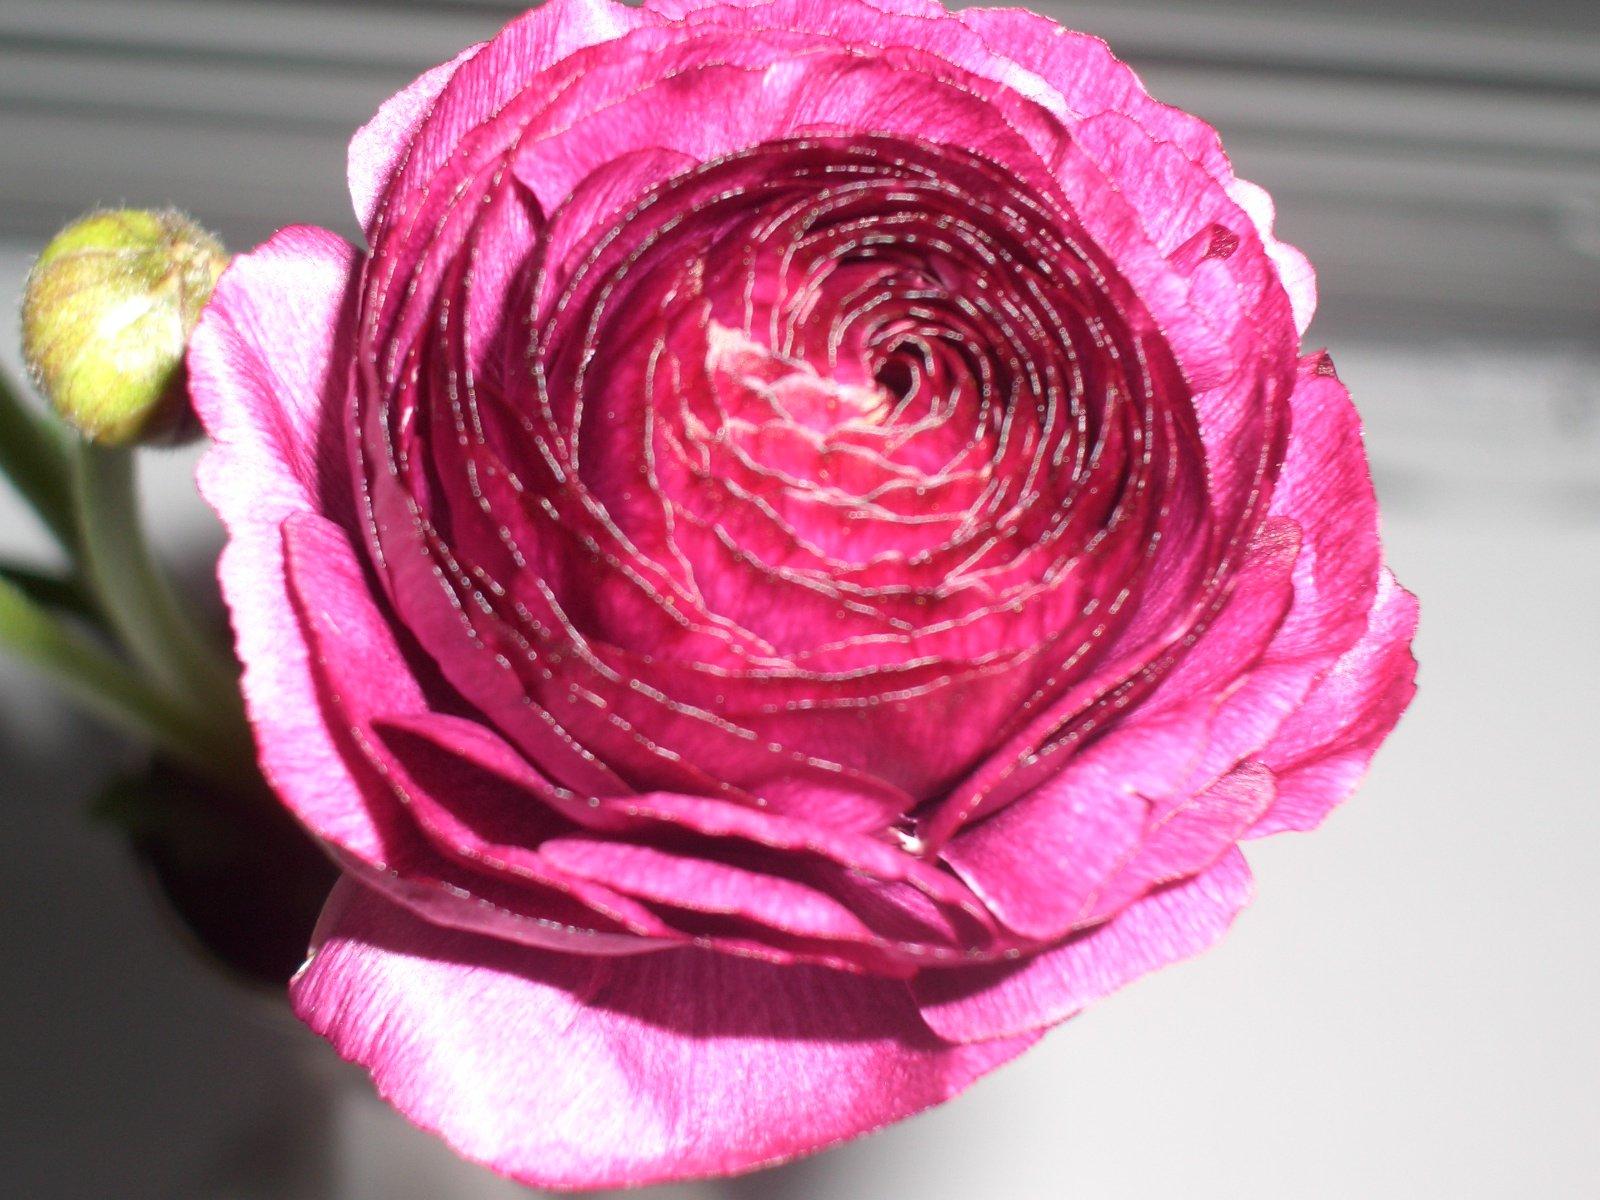 ranunculus flower care